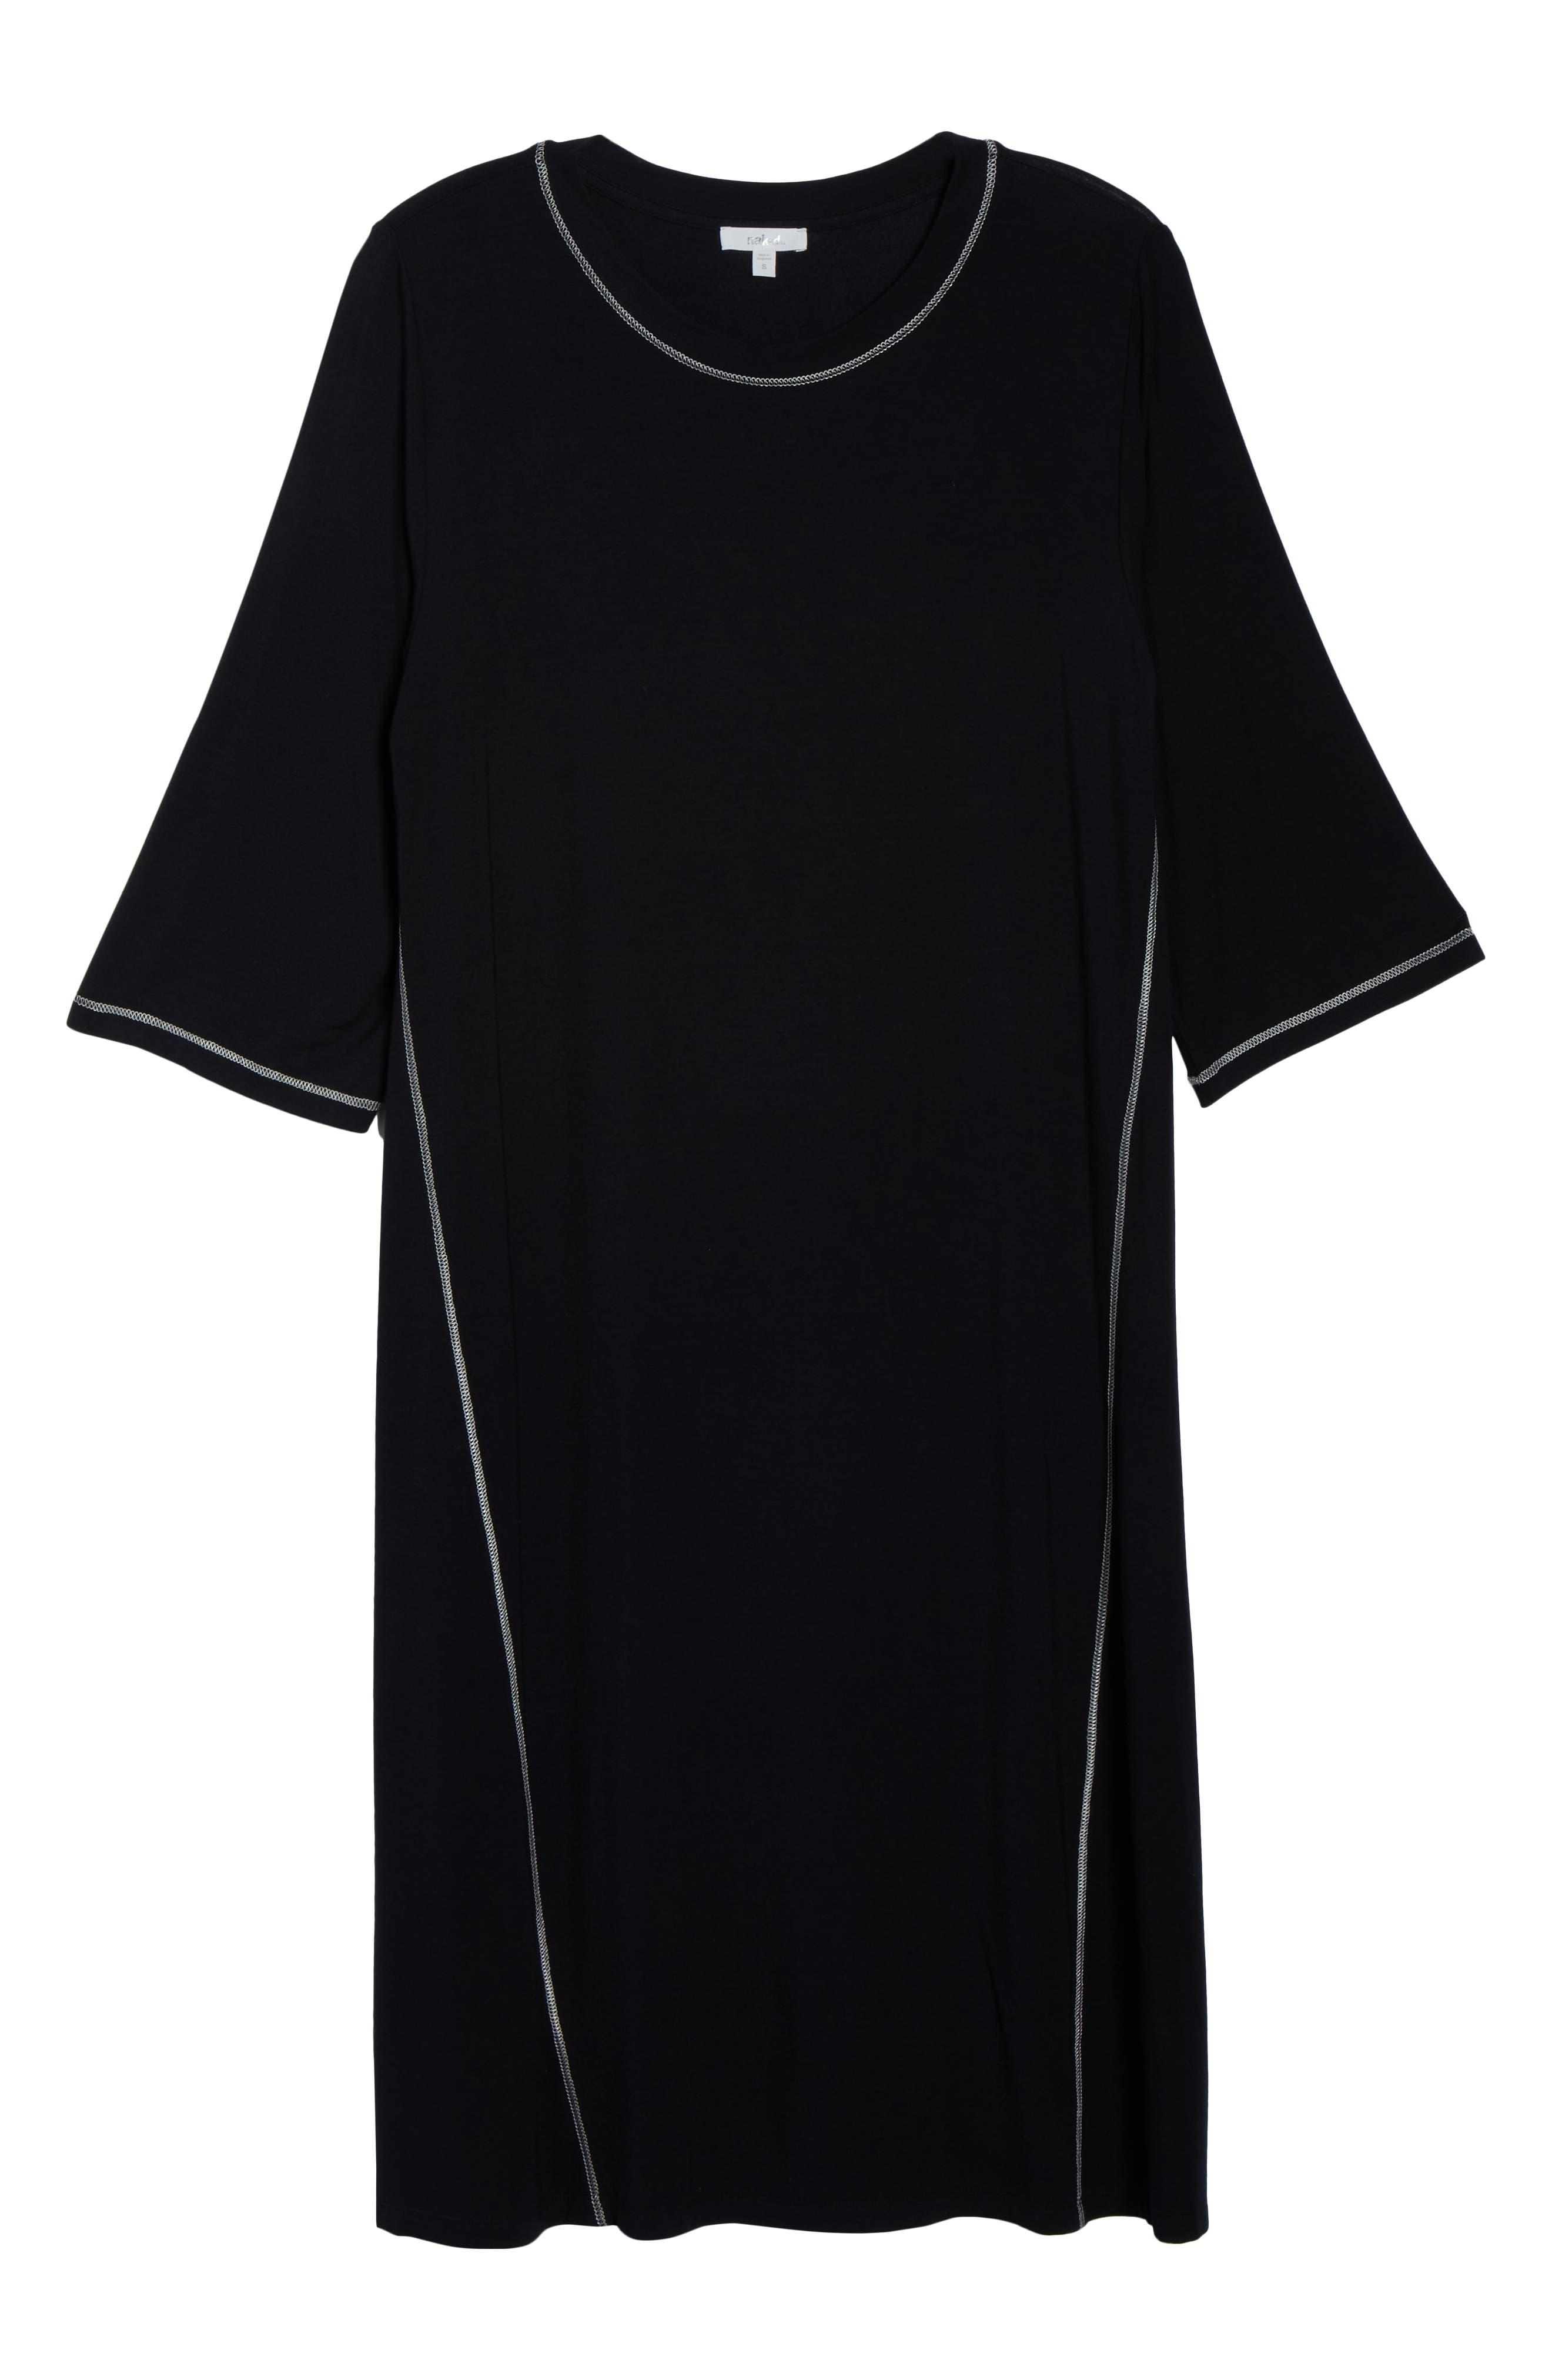 Luxury Sleep Shirt,                             Alternate thumbnail 6, color,                             BLACK